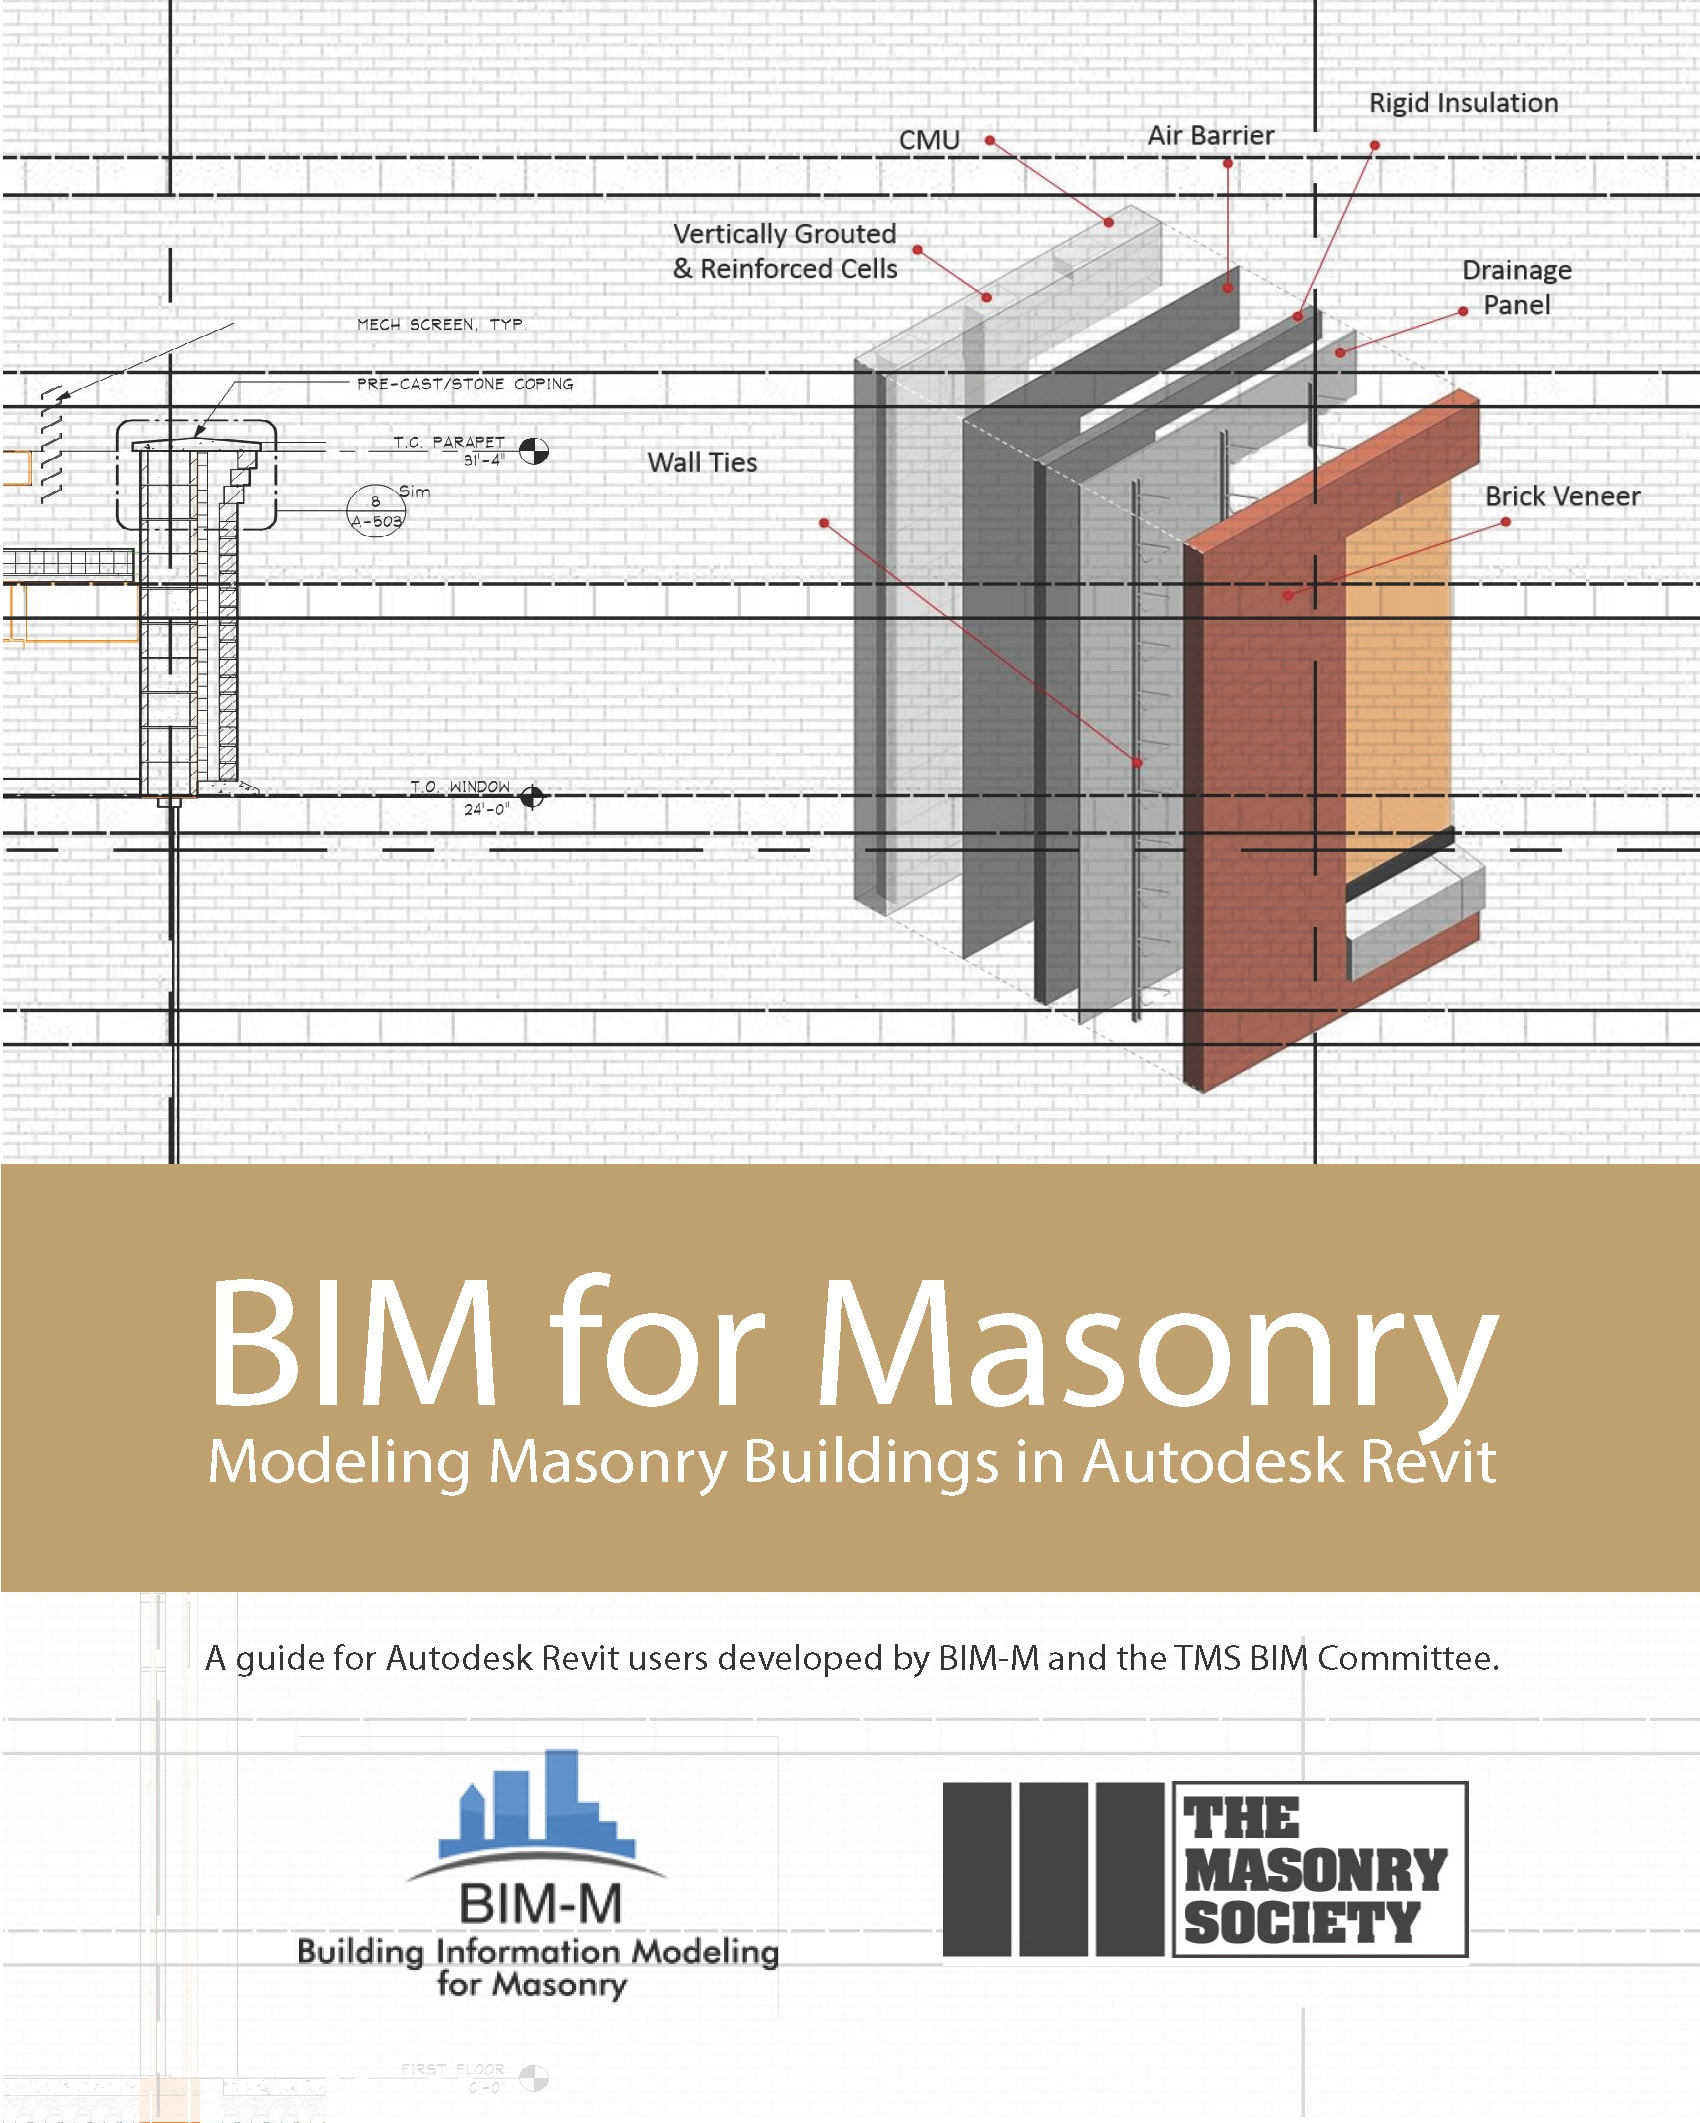 BIM for Masonry Modeling Masonry Buildings in Autodesk Revit